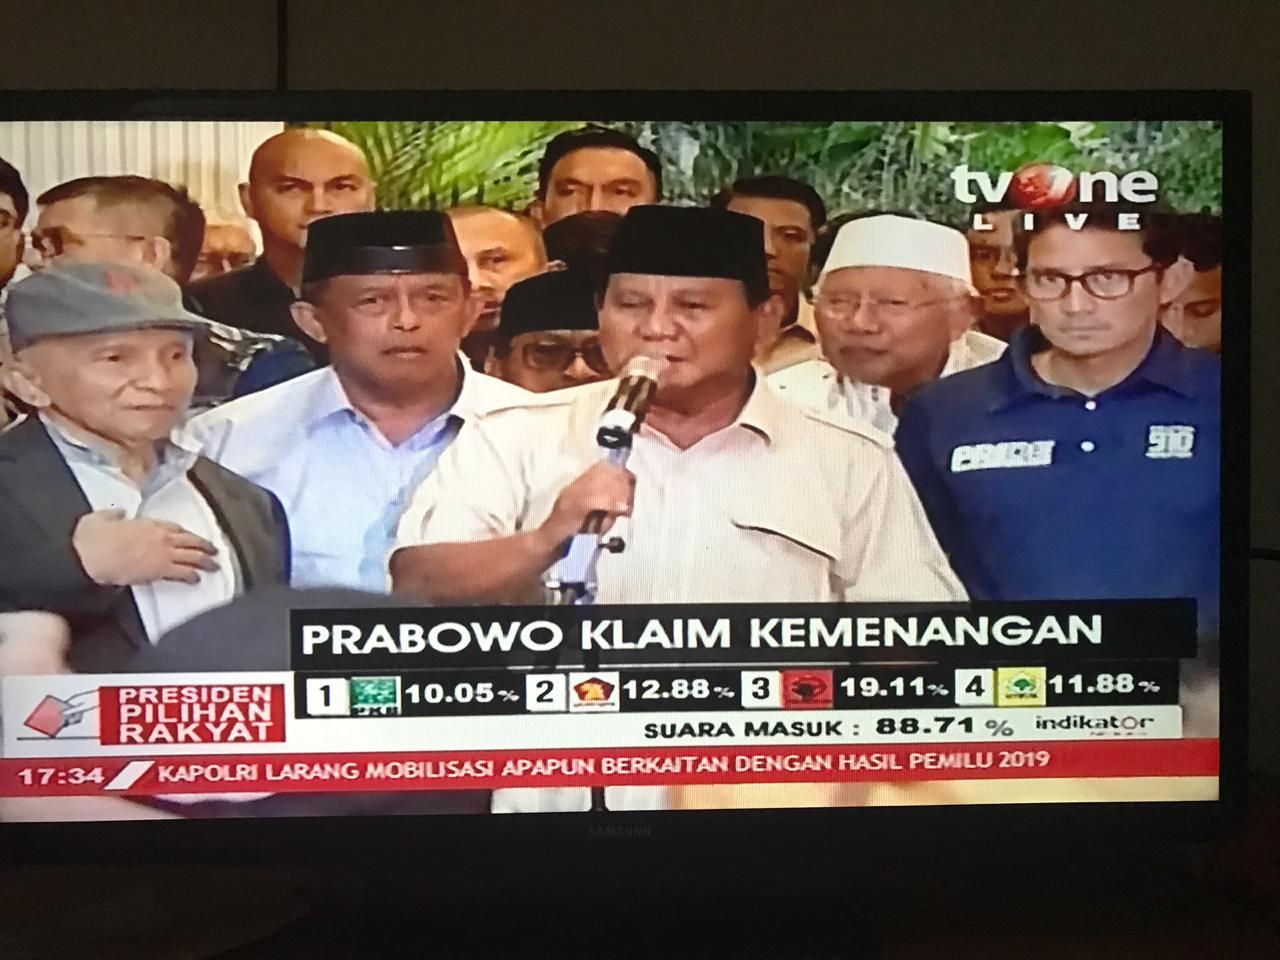 Bukan Hura-Hura, Ini Ajakan Prabowo kepada Rakyat Indonesia